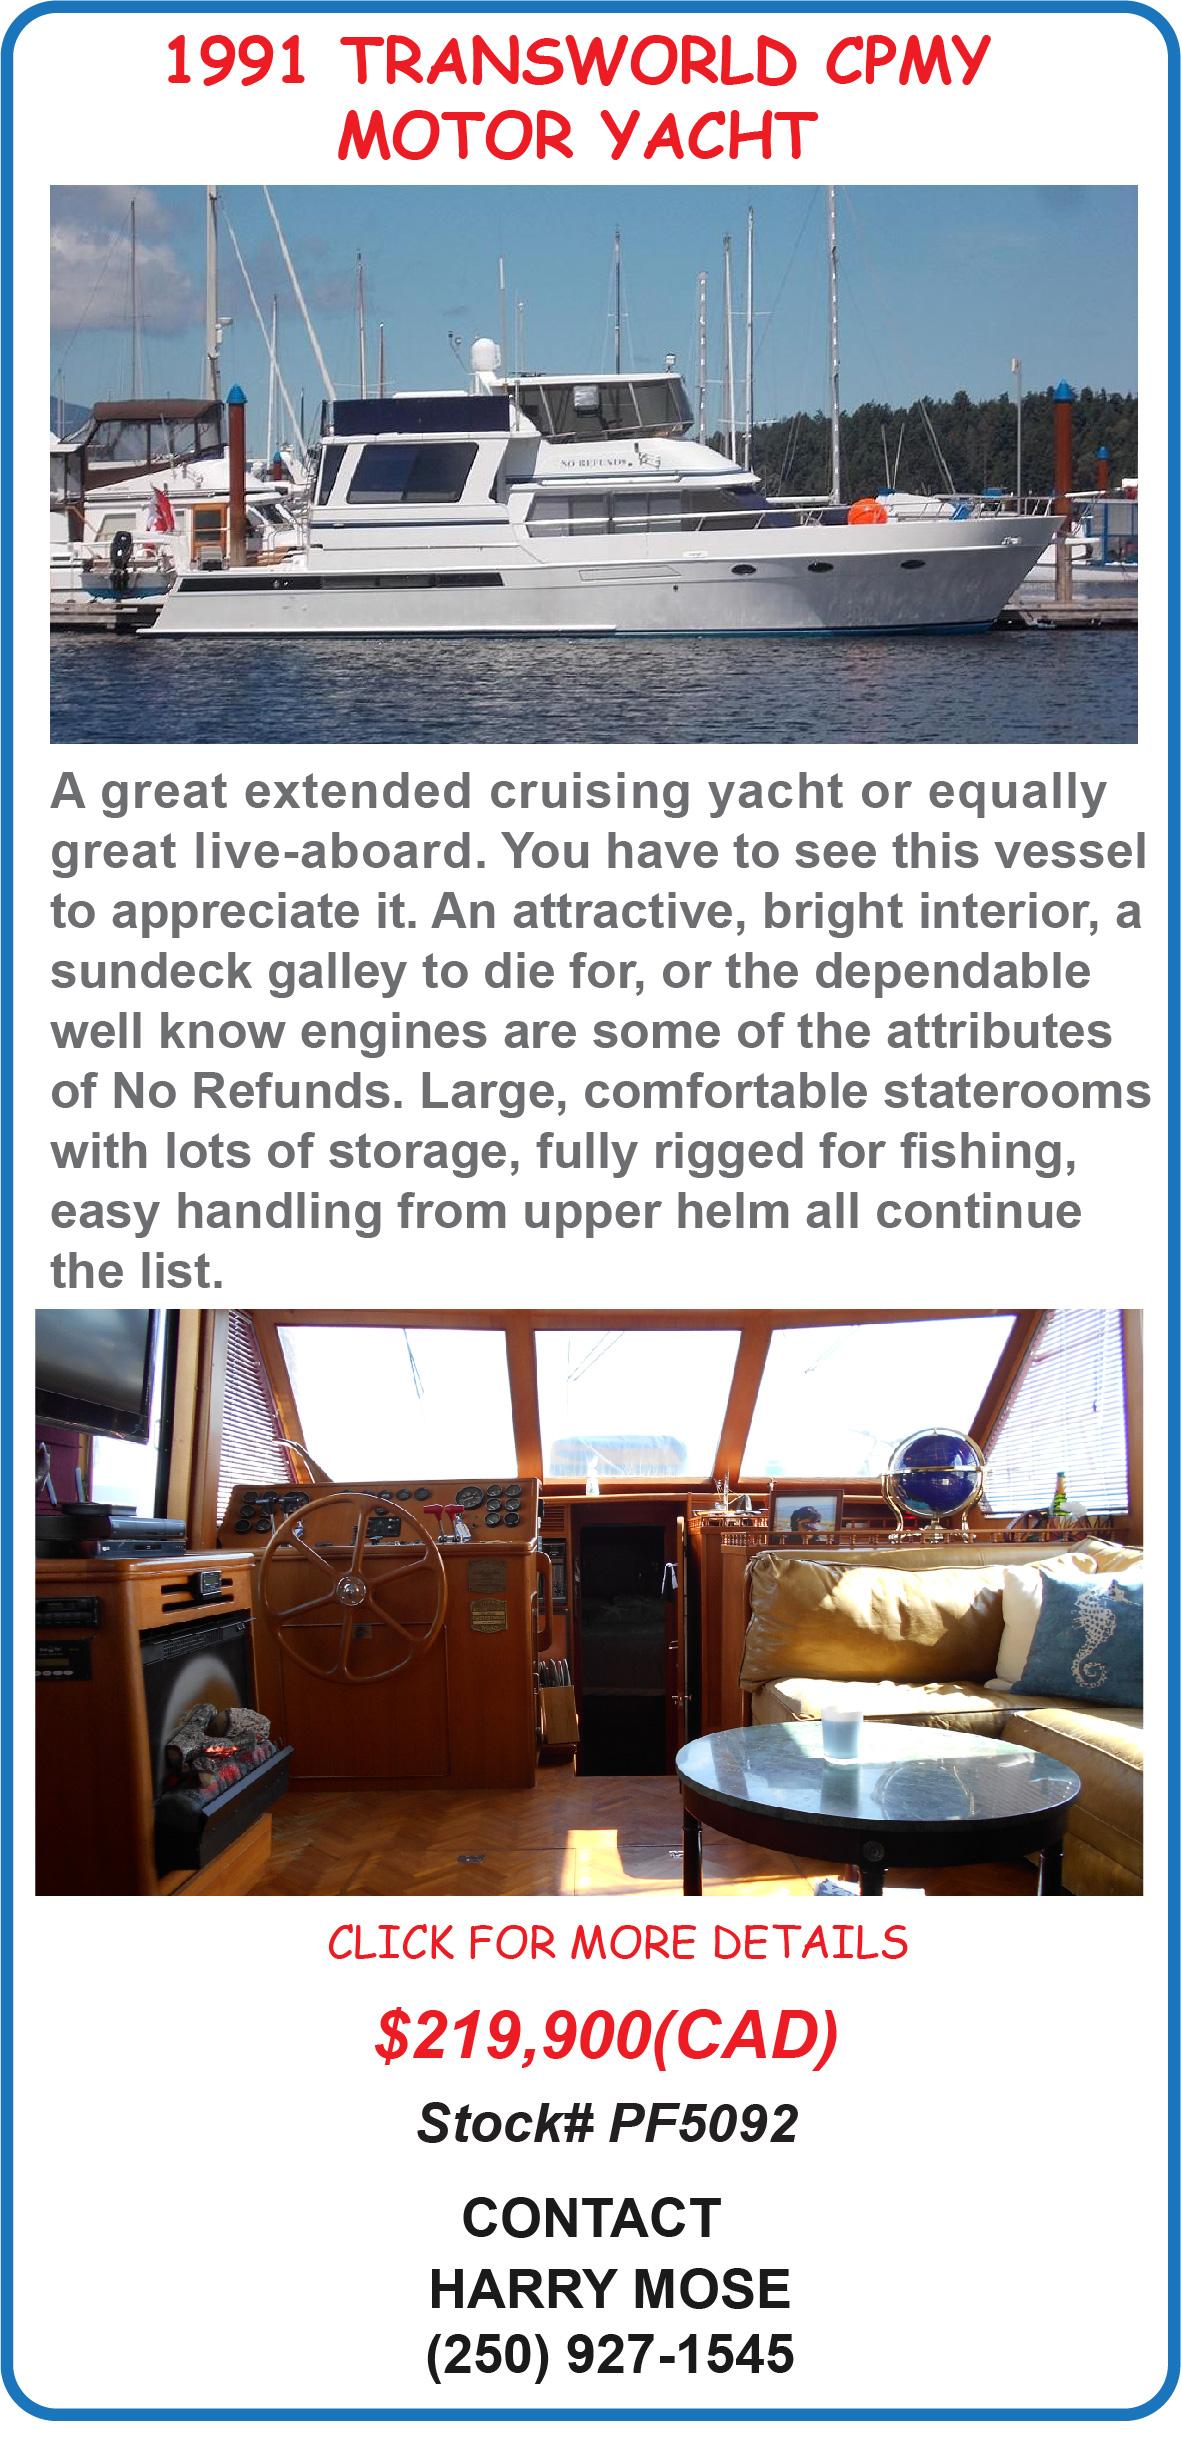 TransWorld CPMY Motor Yacht